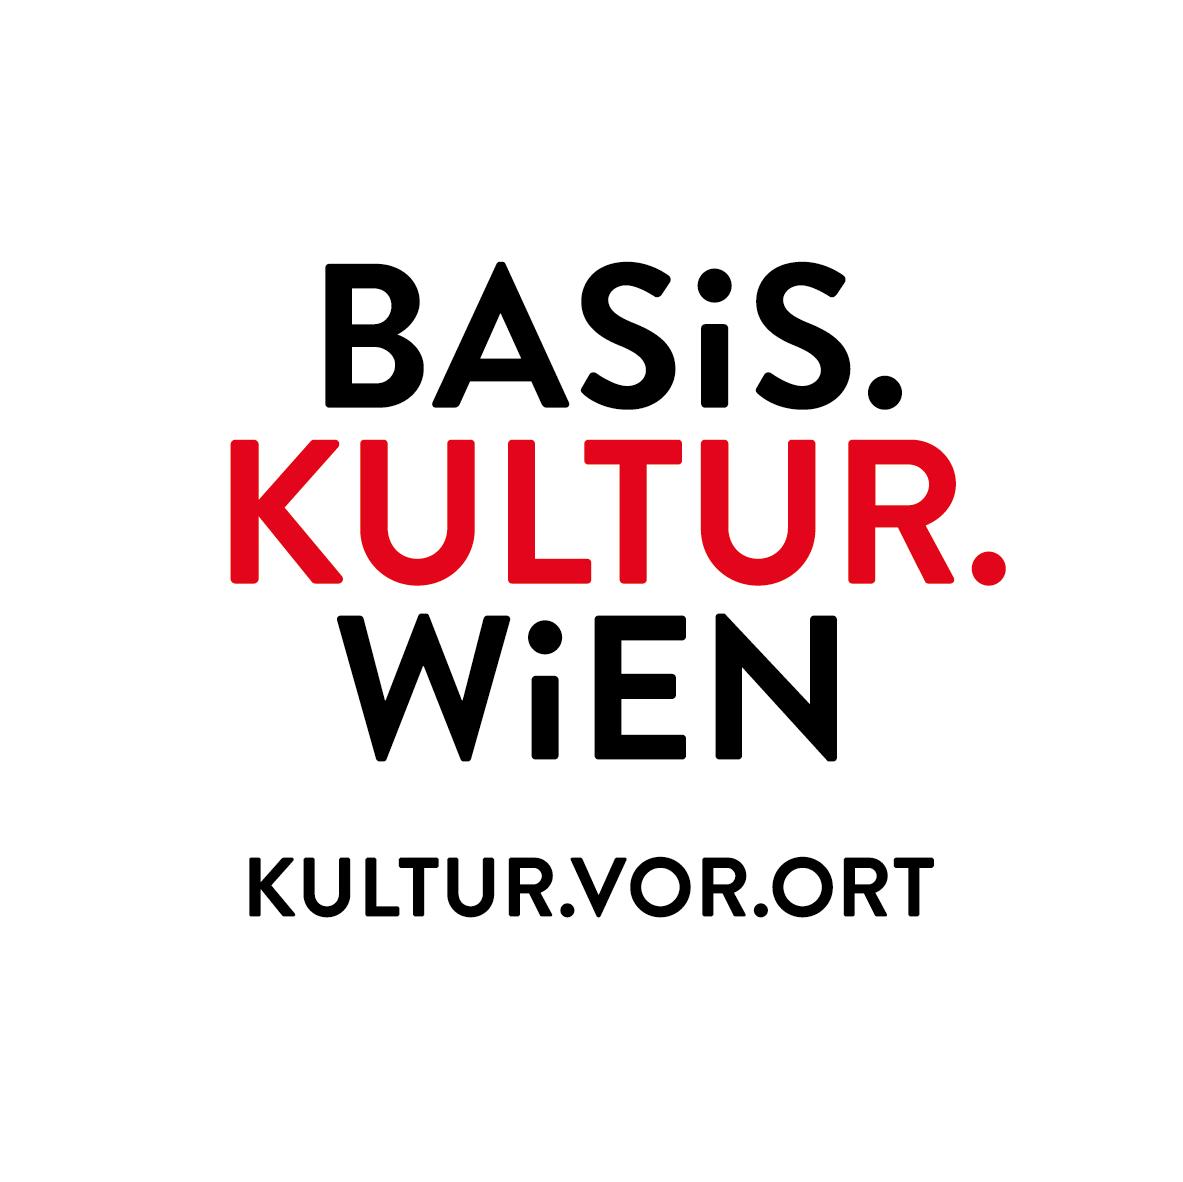 Basis-Kultur-Wien_Logo_Referatsabteilungslogo_Kultur-Vor-Ort_3C.png